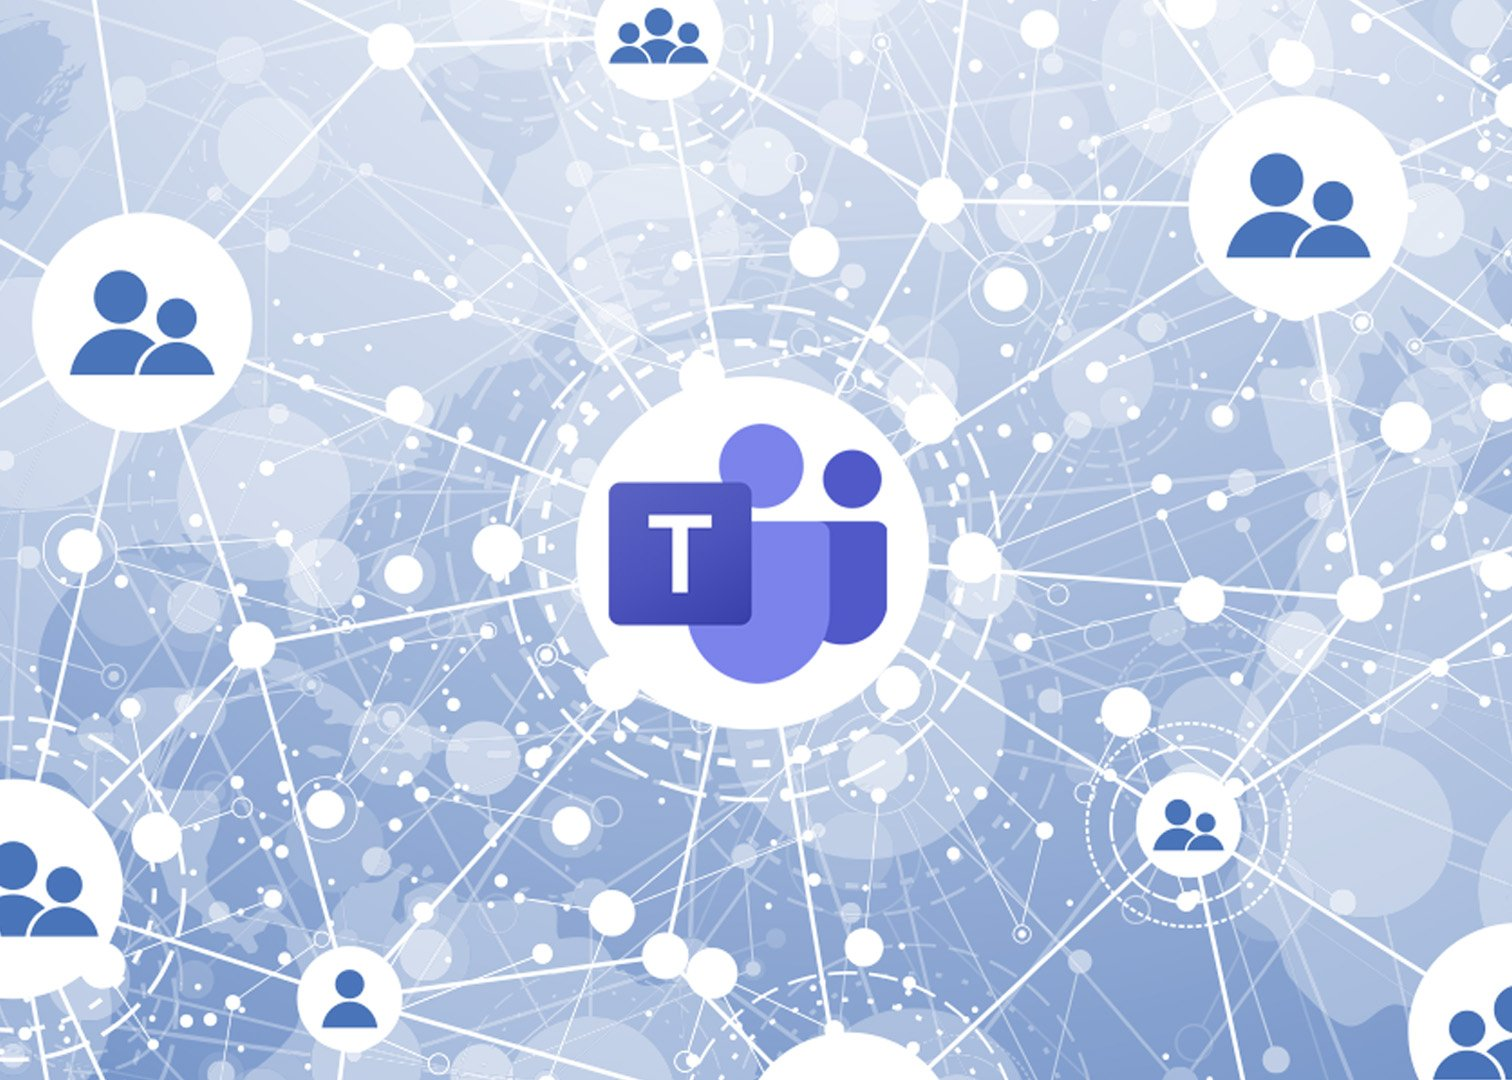 Collaboration made easier through Microsoft Teams